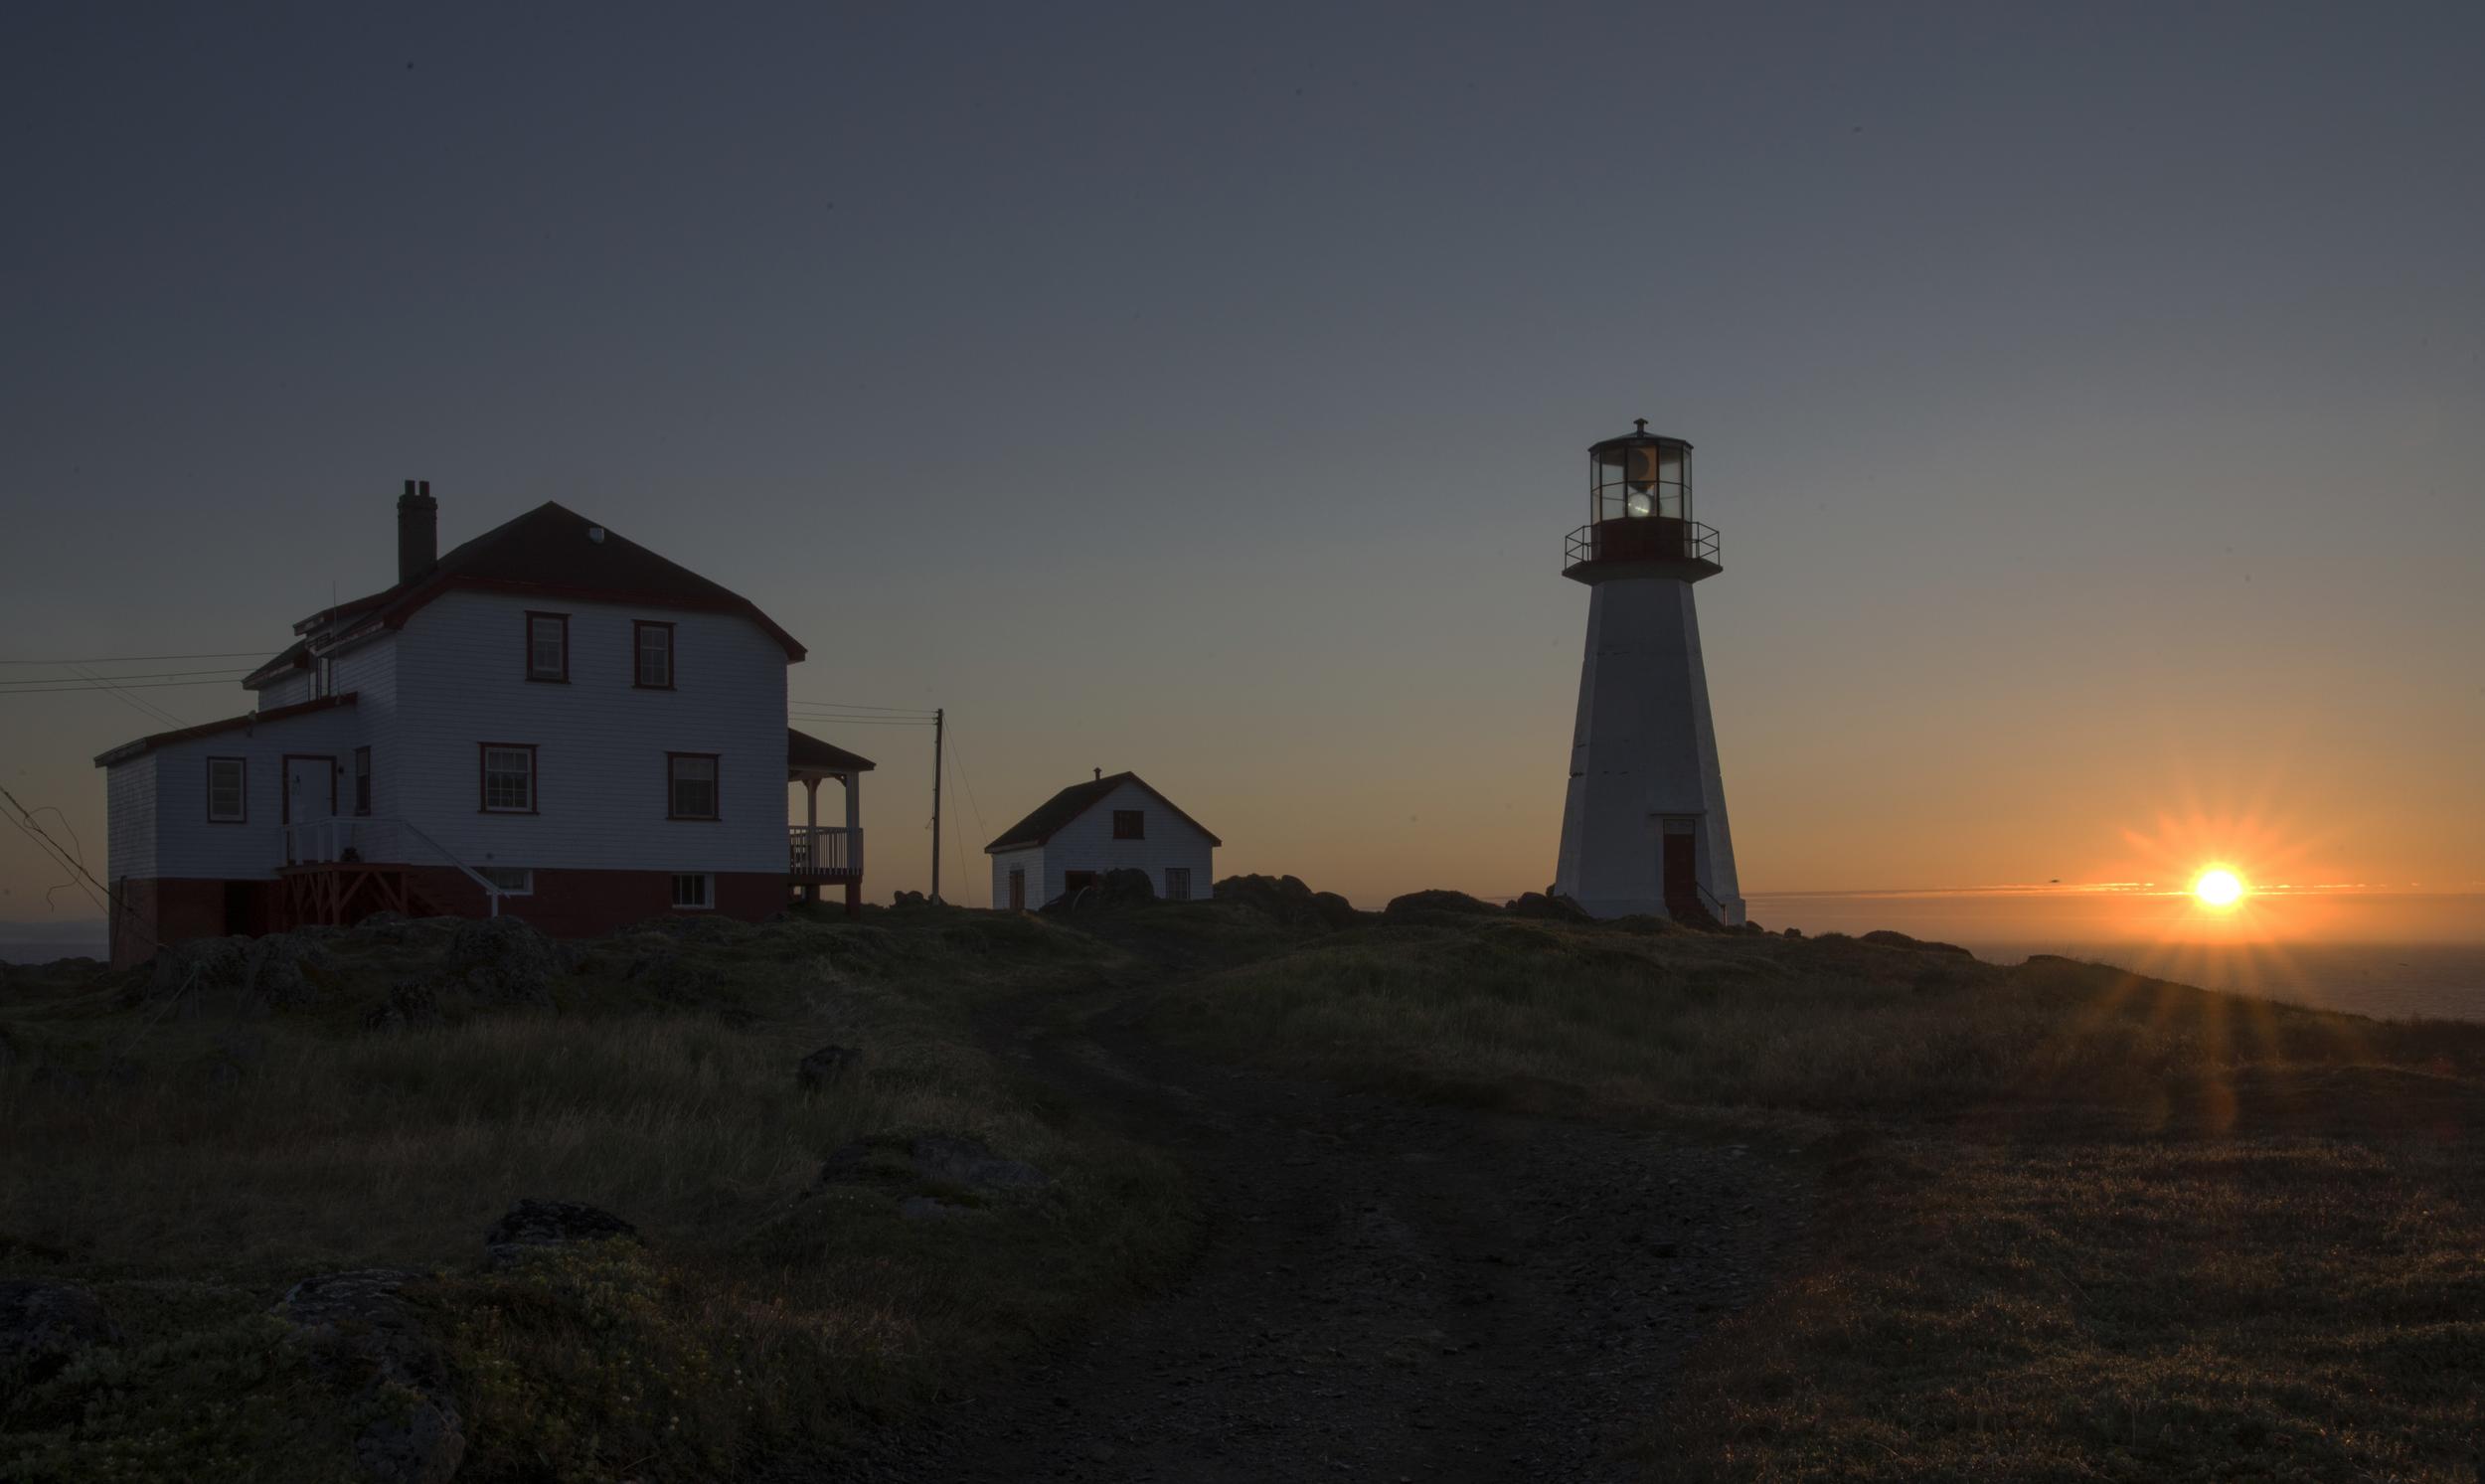 sunrise+at+quirpon+island.jpg